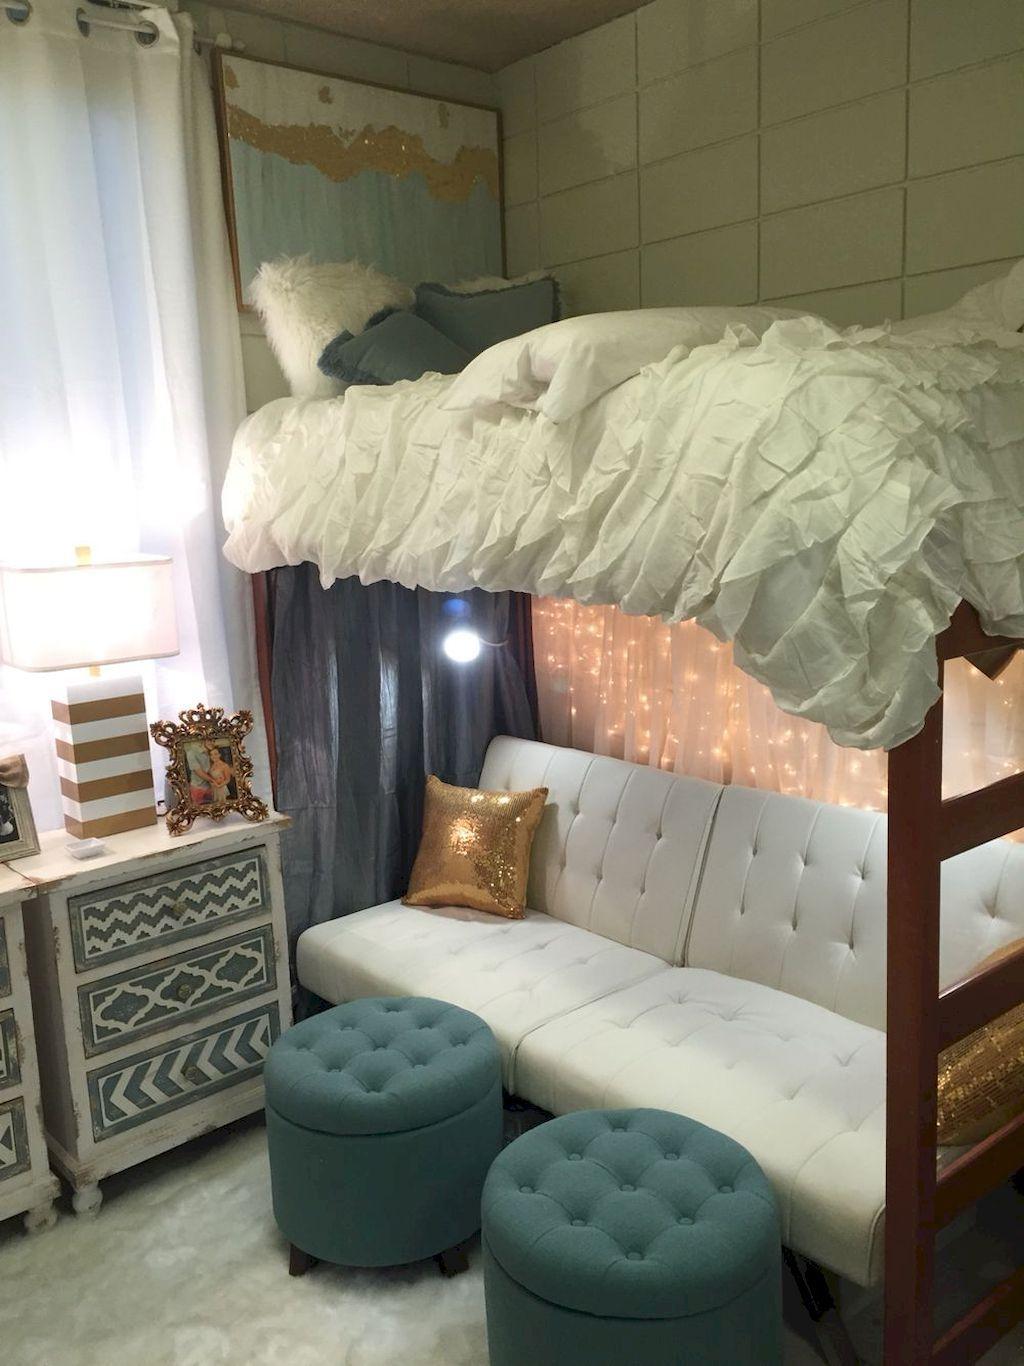 Under loft bed decorating ideas   Cute Loft Beds College Dorm Room Design Ideas For Girl  Dorm